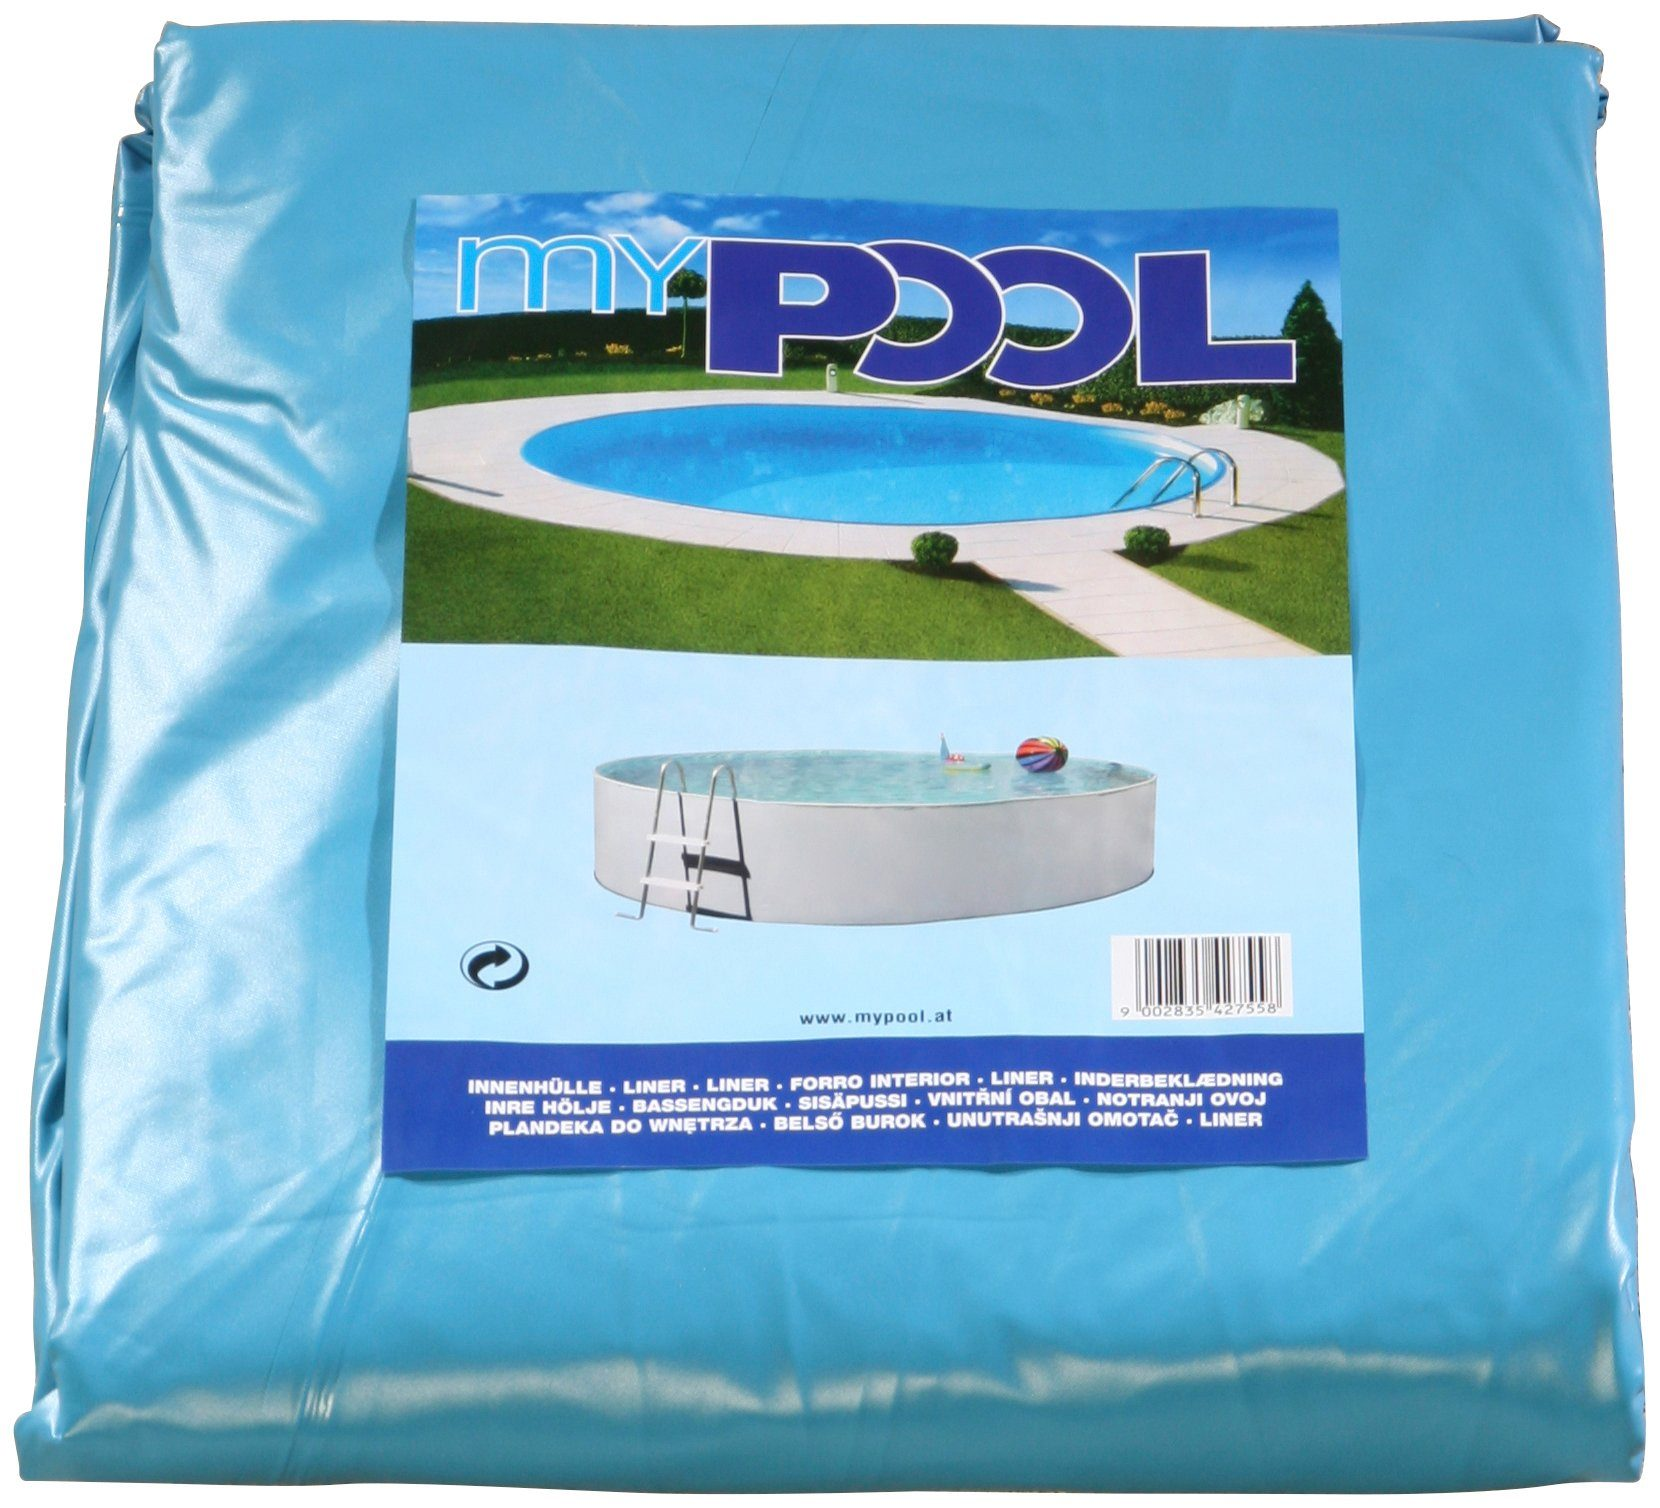 MYPOOL Pool-Innenhülle , für ØxH: 400x120 cm, 0,4 mm, blau